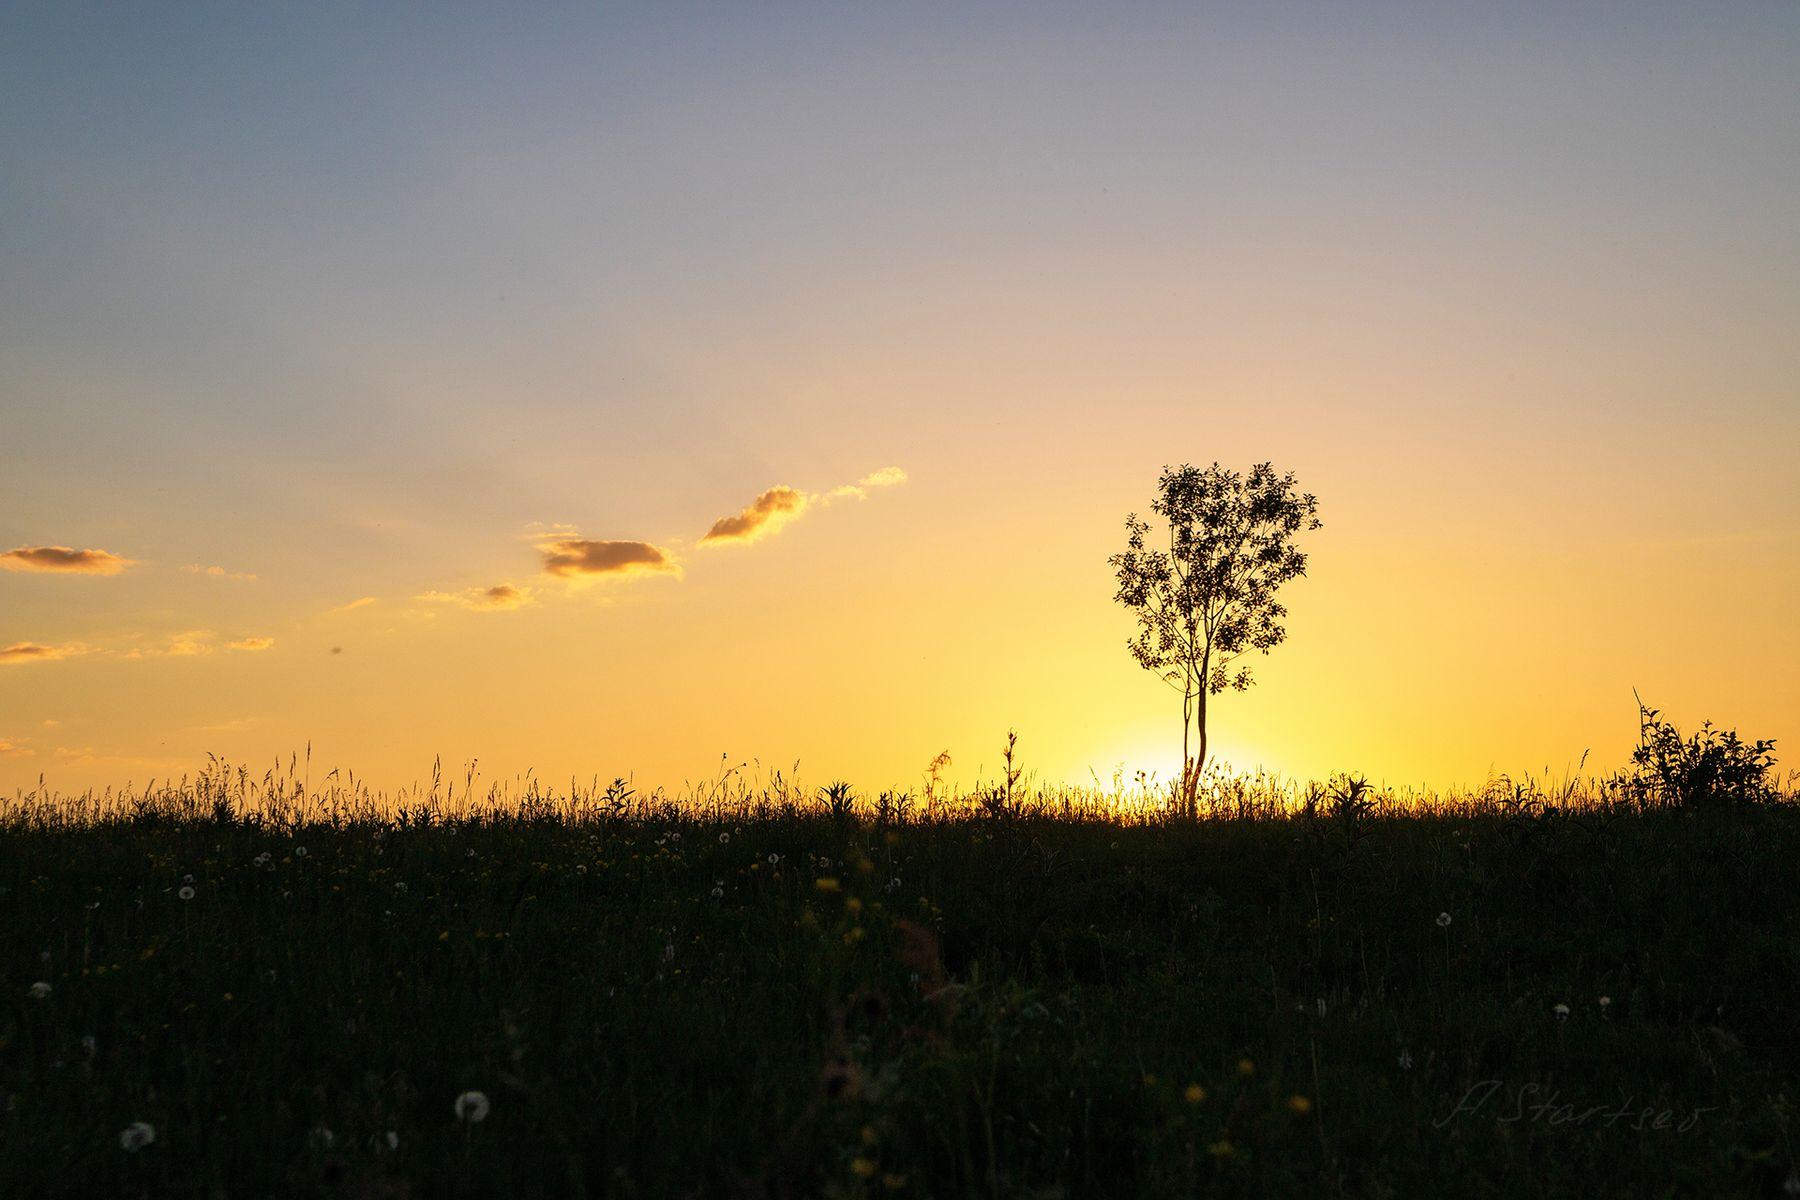 Дерево дерево лето пейзаж природа небо Пермский_край вечер закат силуэт минимализм